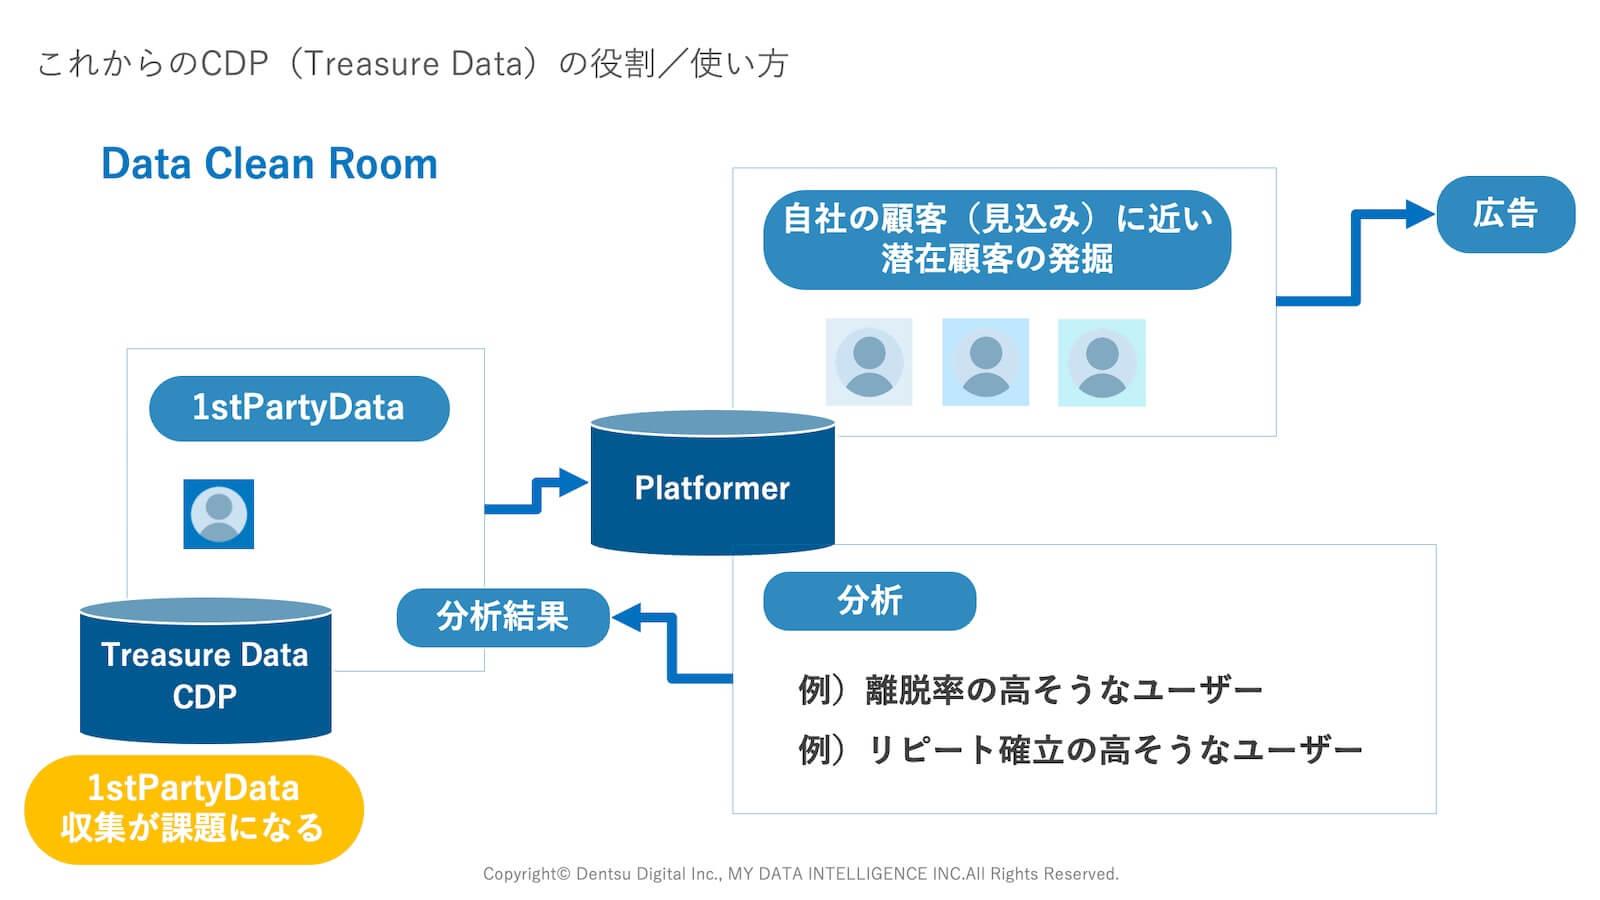 Treasure Data CDPとData Clean Room